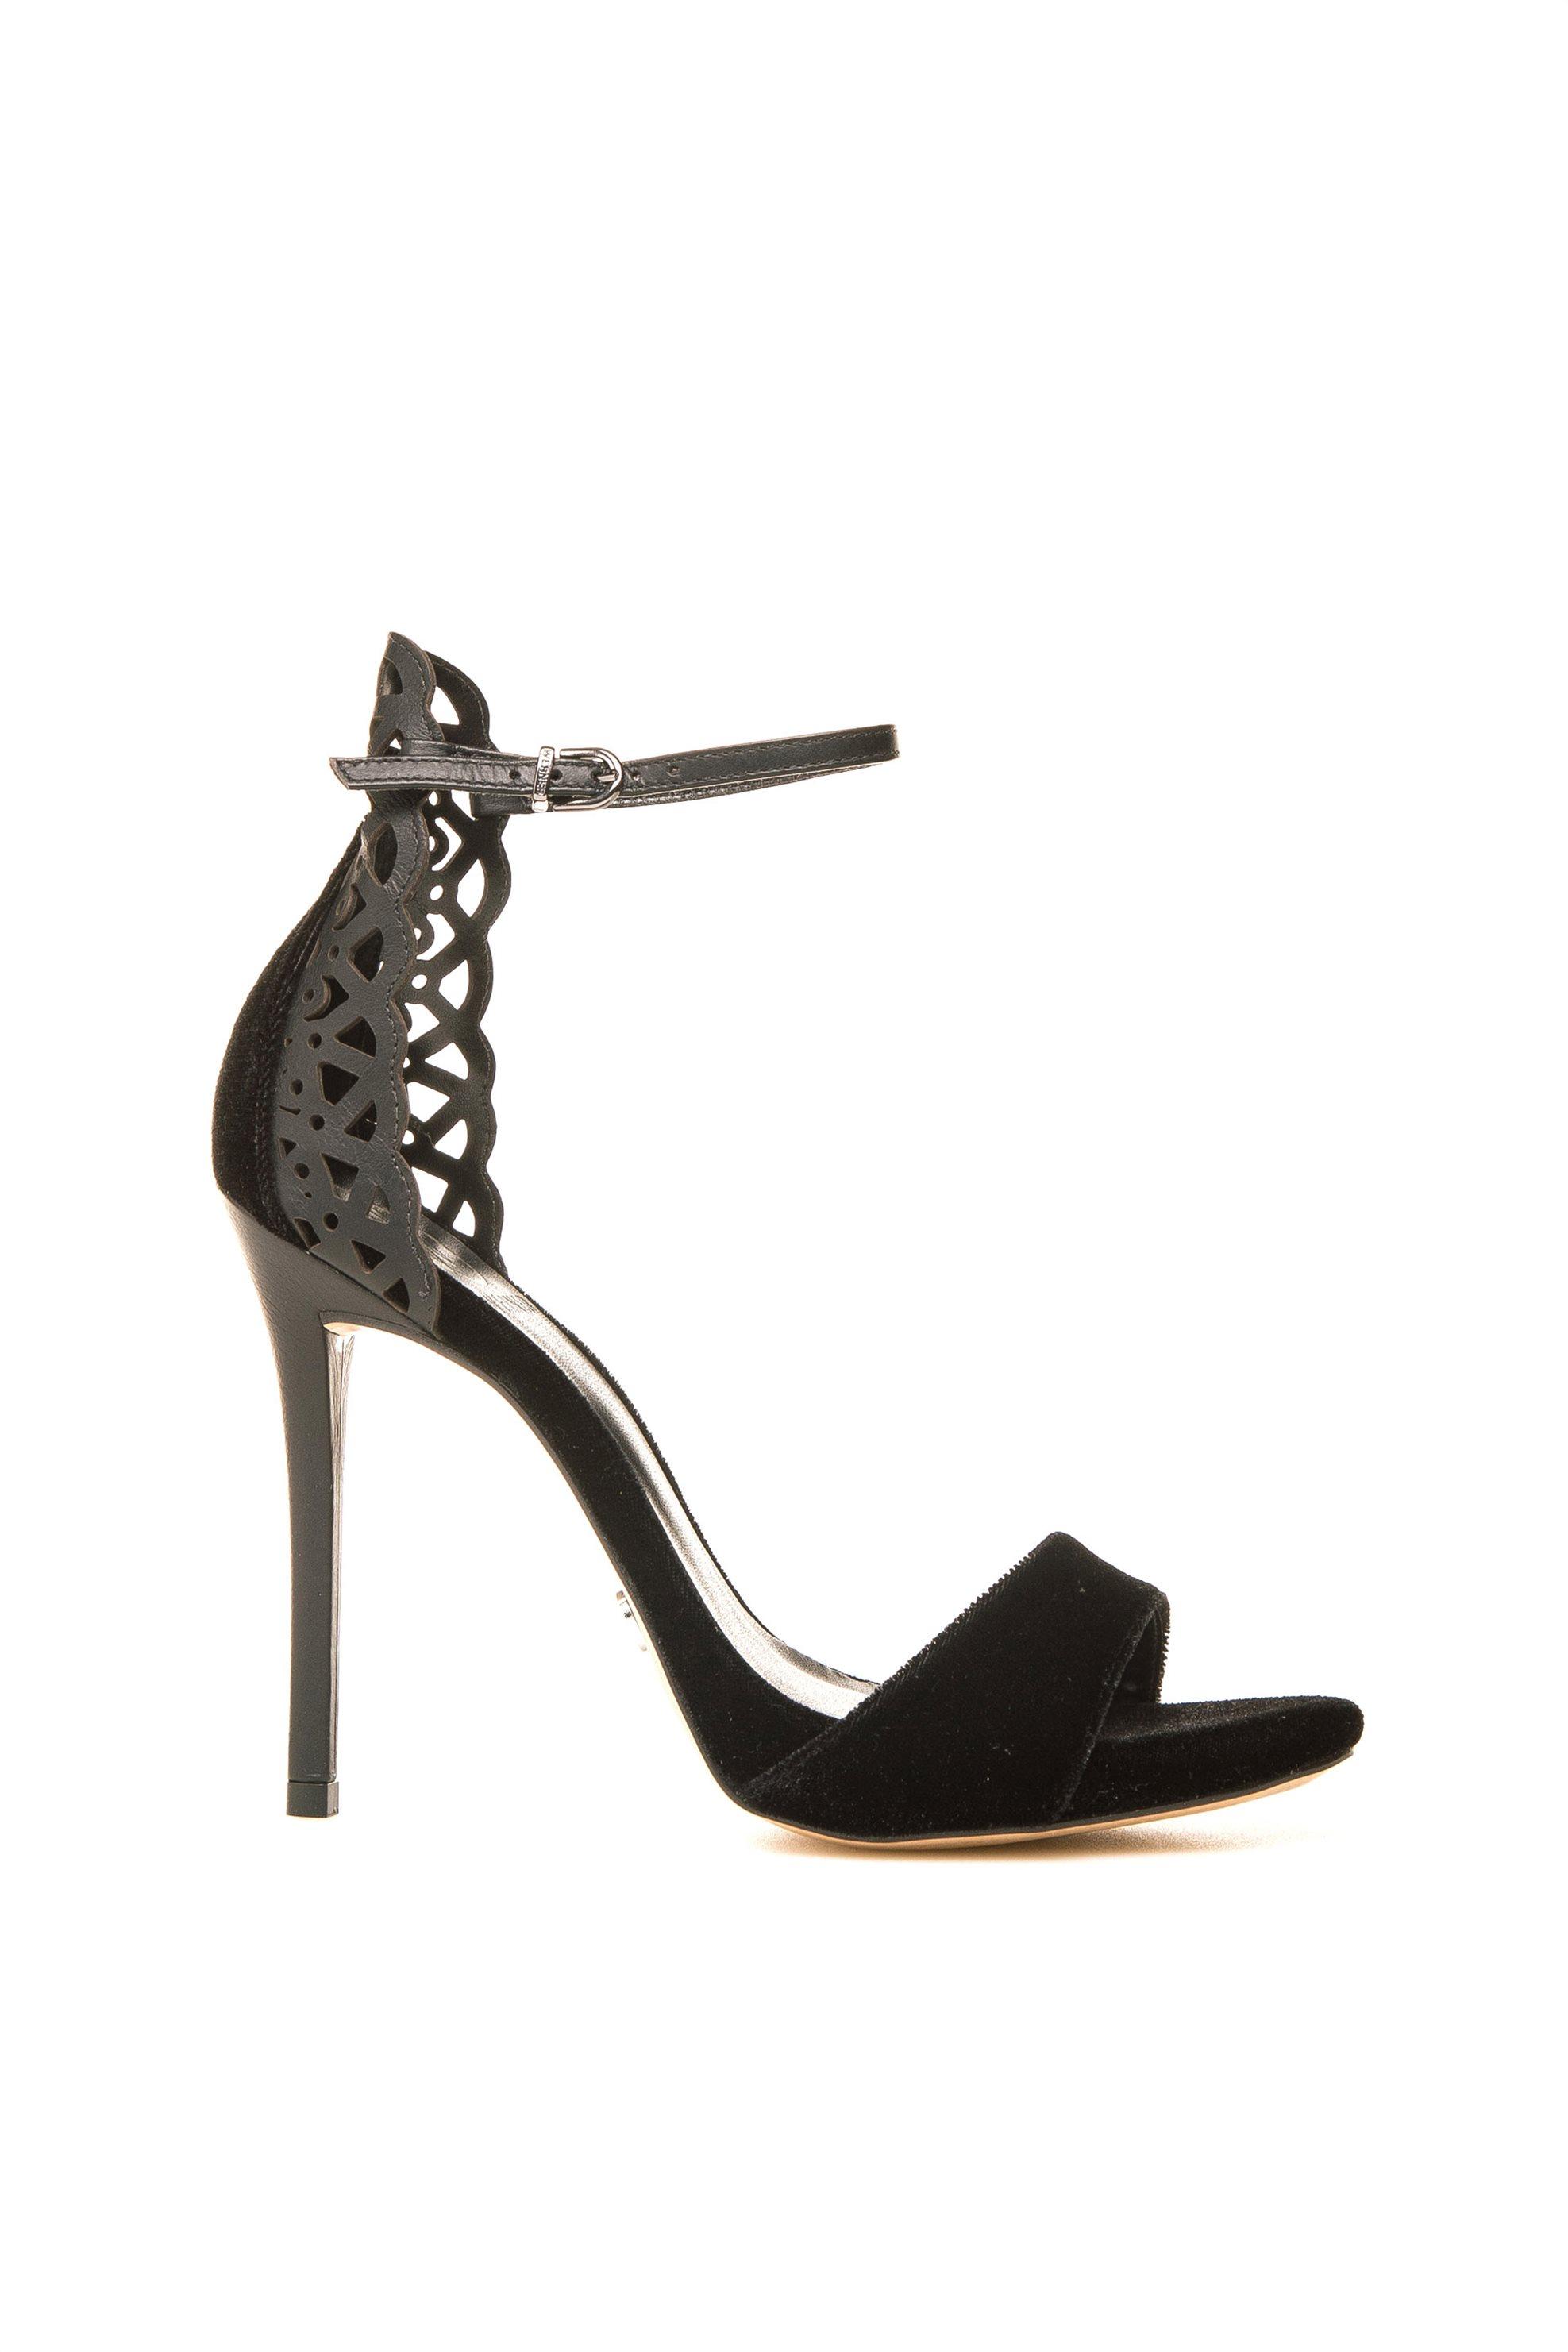 WERNER γυναικεία πέδιλα ψηλότακουνα βελούδο - 119658-VELVET - Μαύρο γυναικα   παπουτσια   πέδιλα   σανδάλια